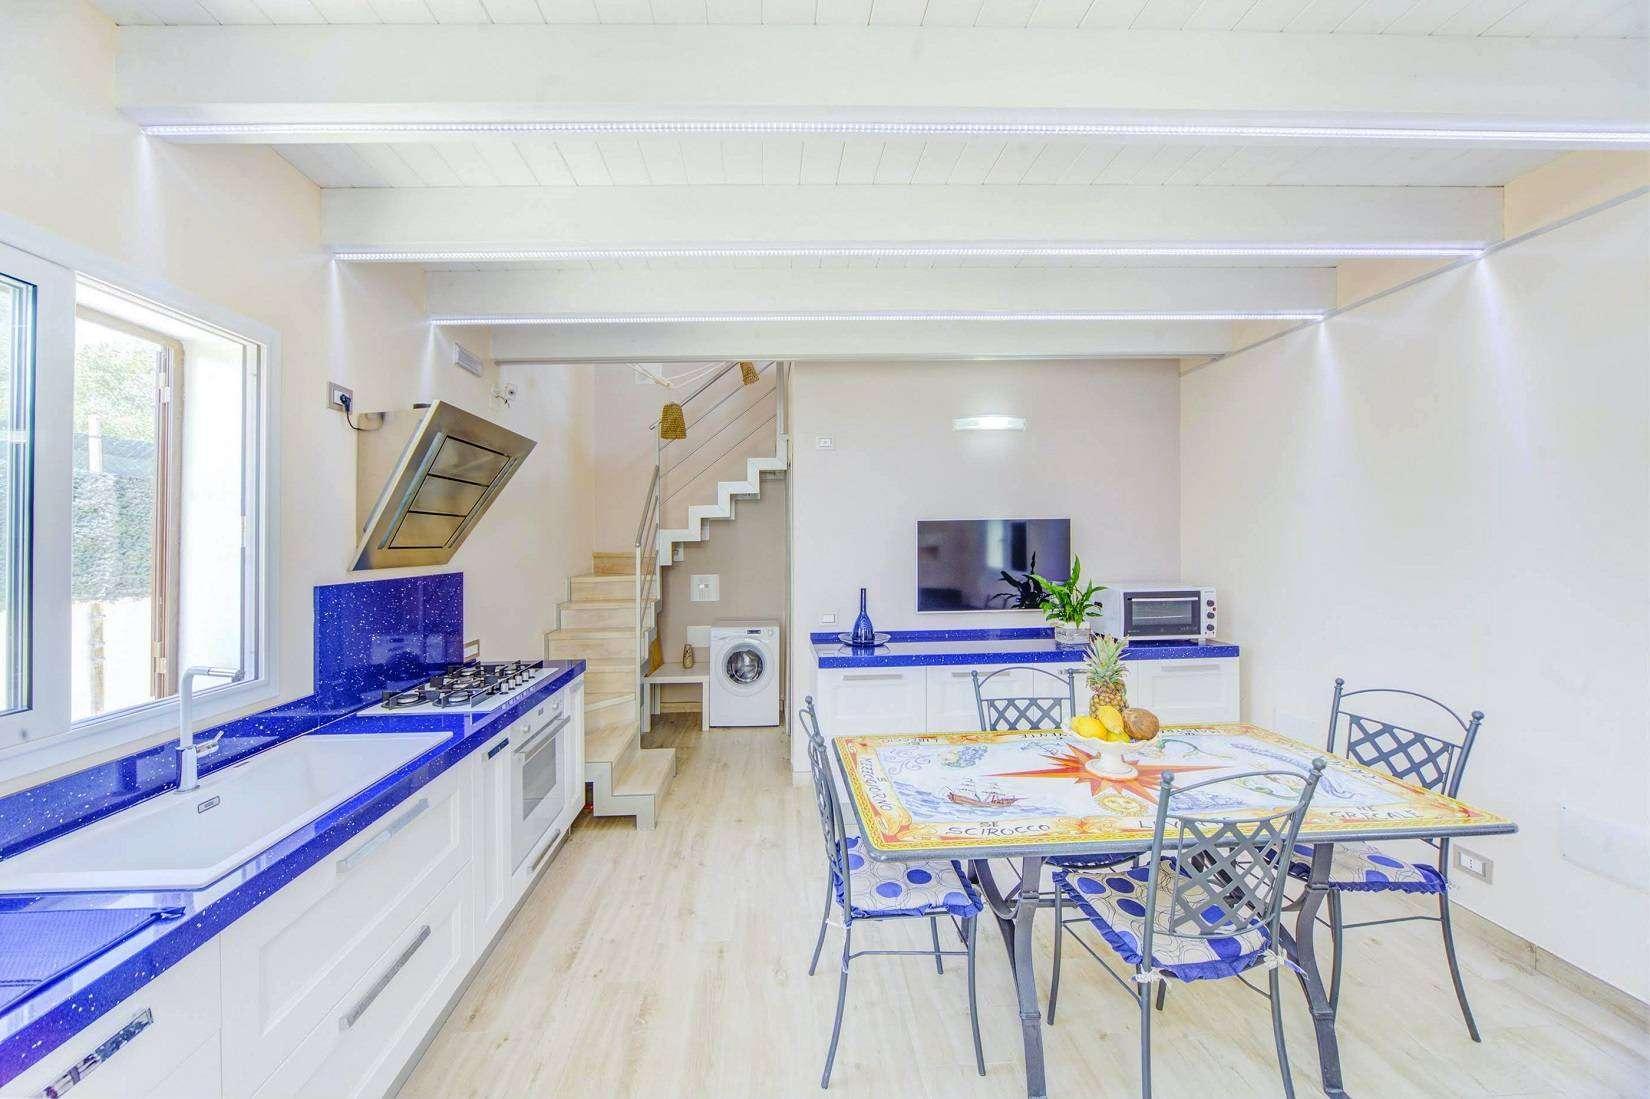 10 Avola Kitchen